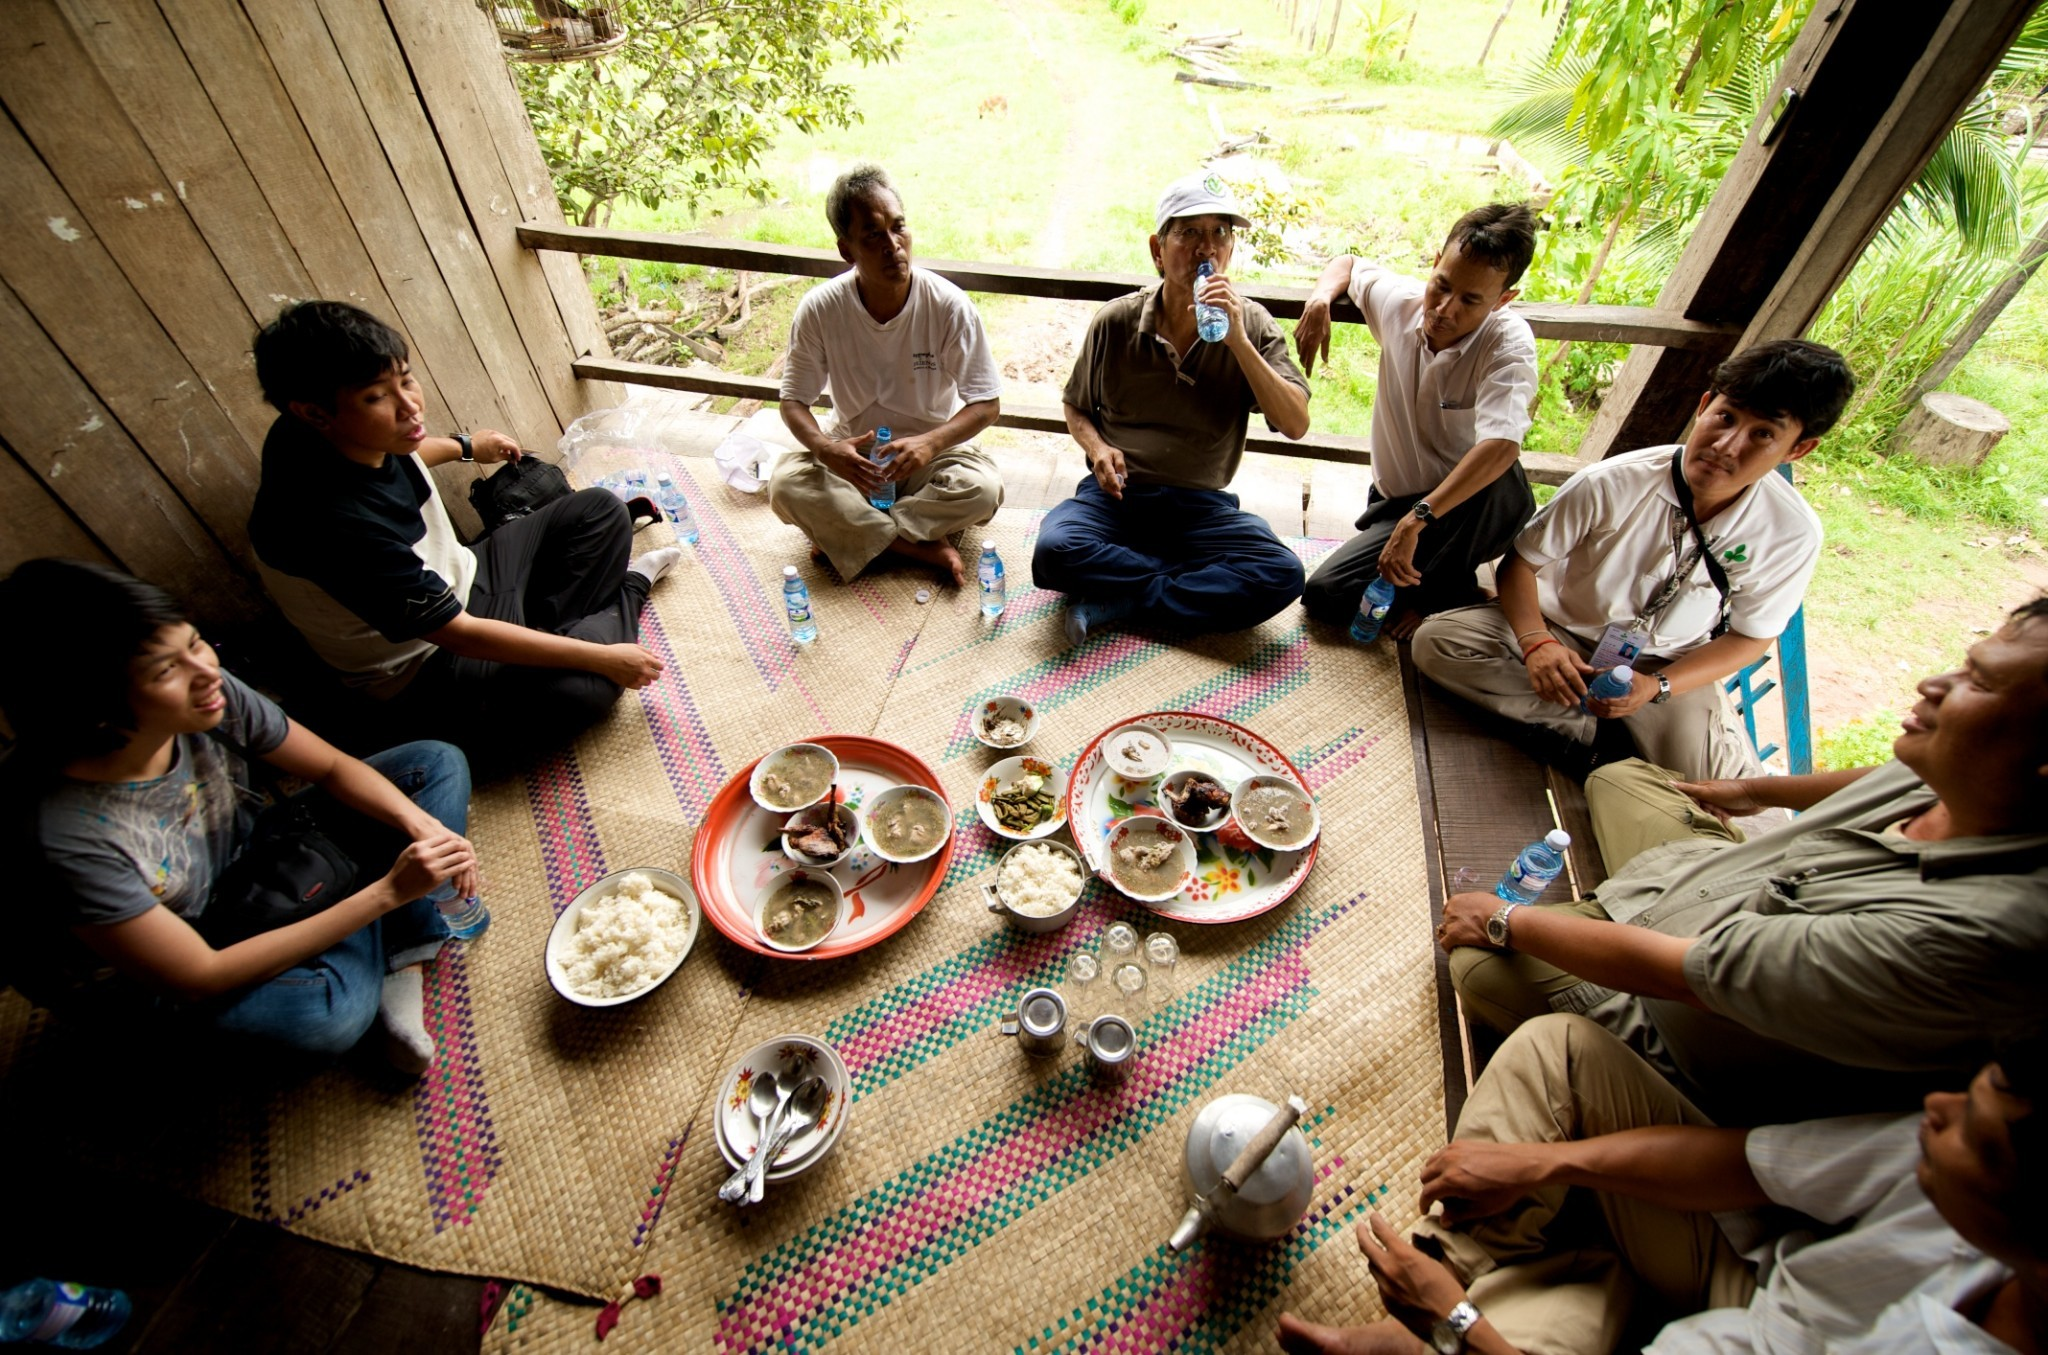 AlexSoh_July09 Cambodia156